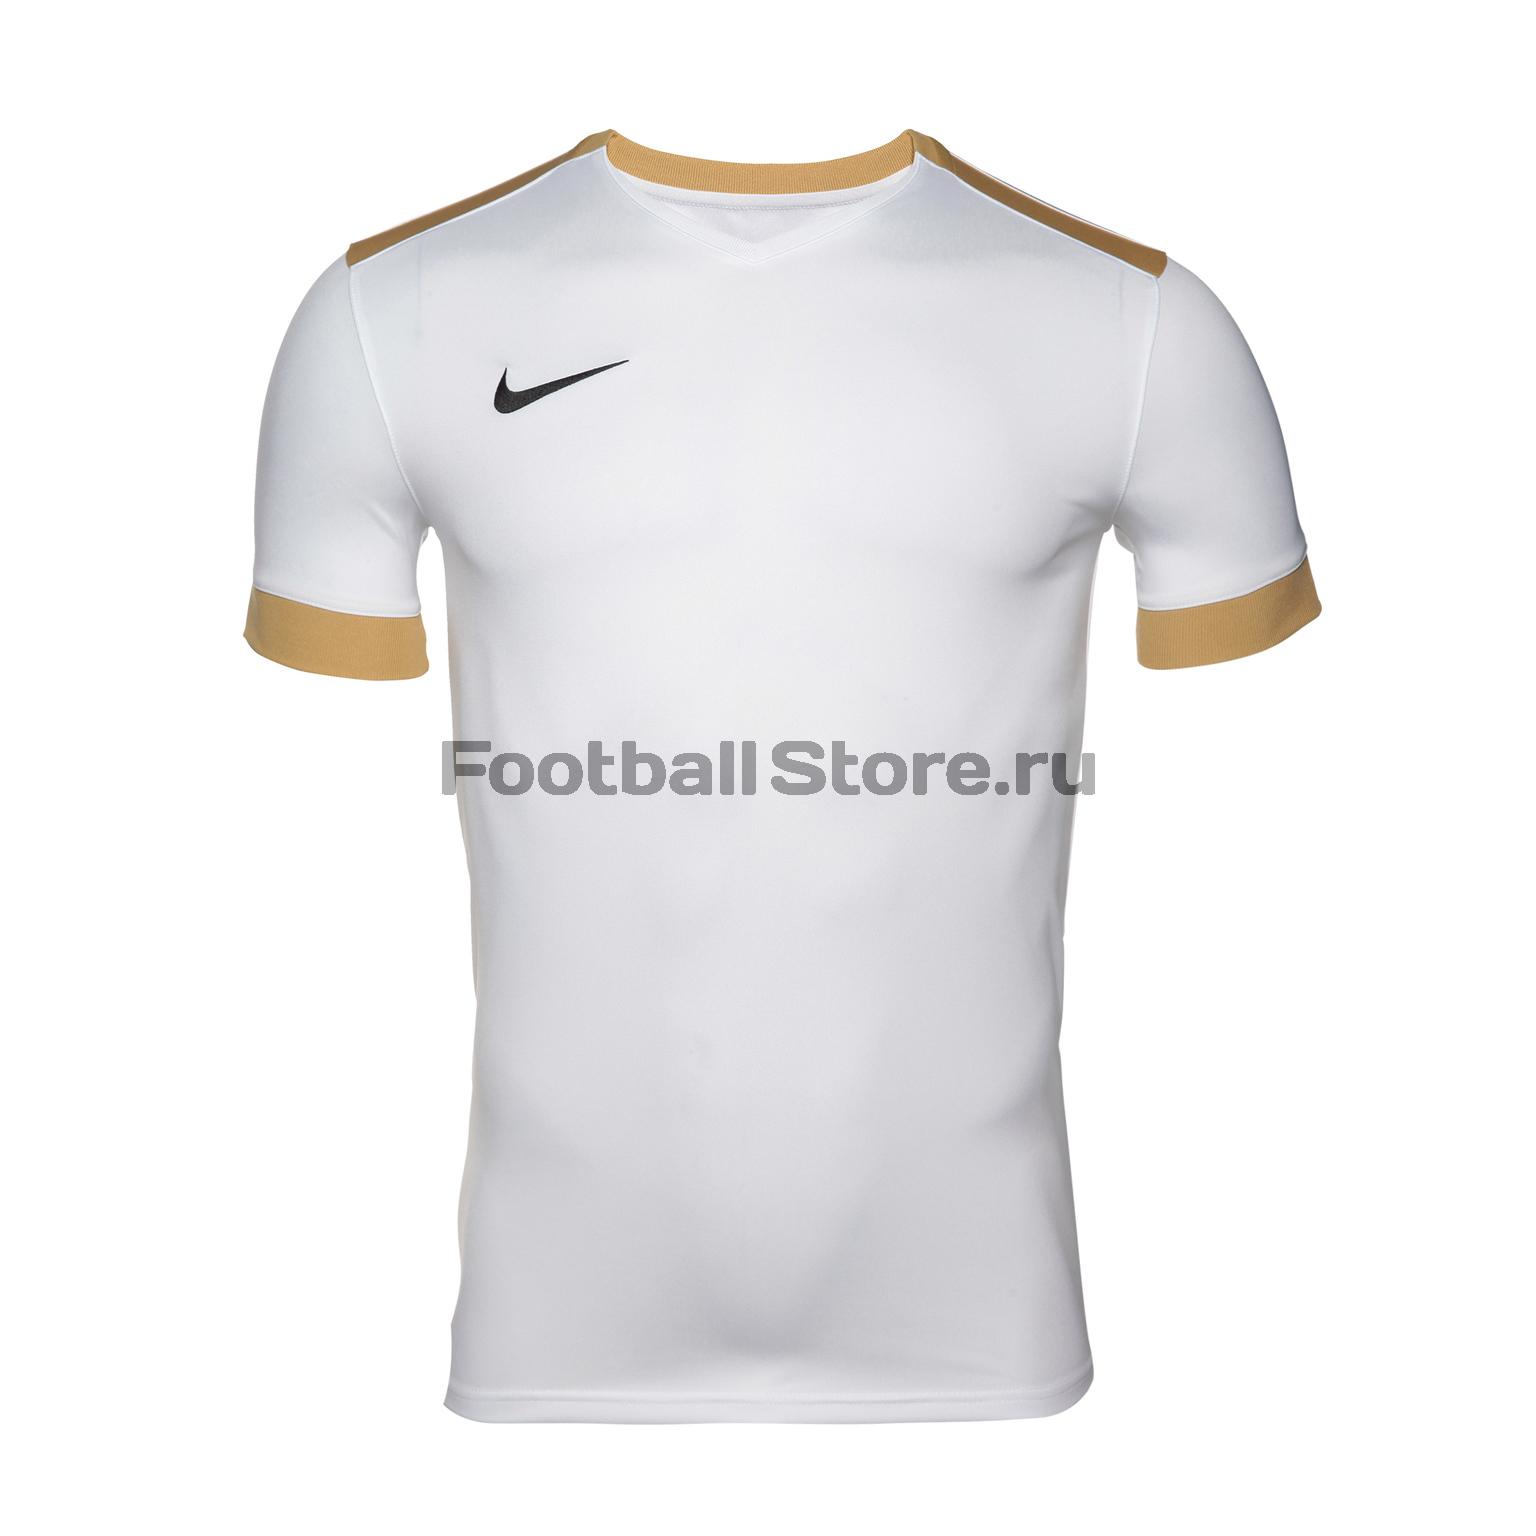 Футболка игровая Nike Park Derby II JSY SS 894312-100 футболка игровая nike ls park derby jsy 588414 106